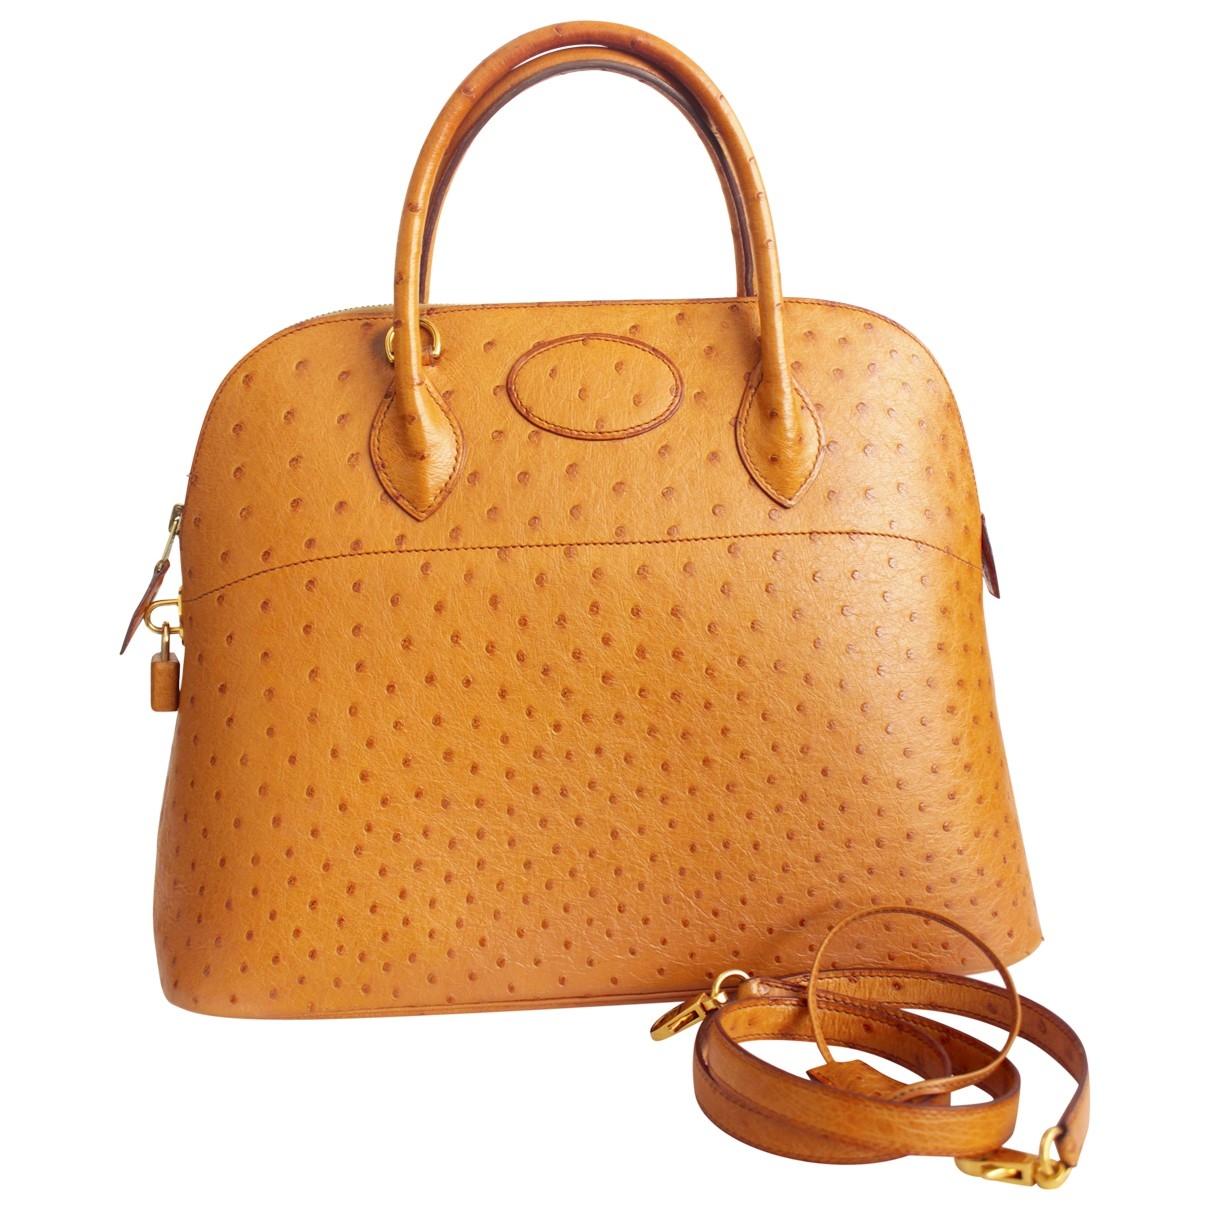 Hermes Bolide Handtasche in  Gold Vogelstrauss